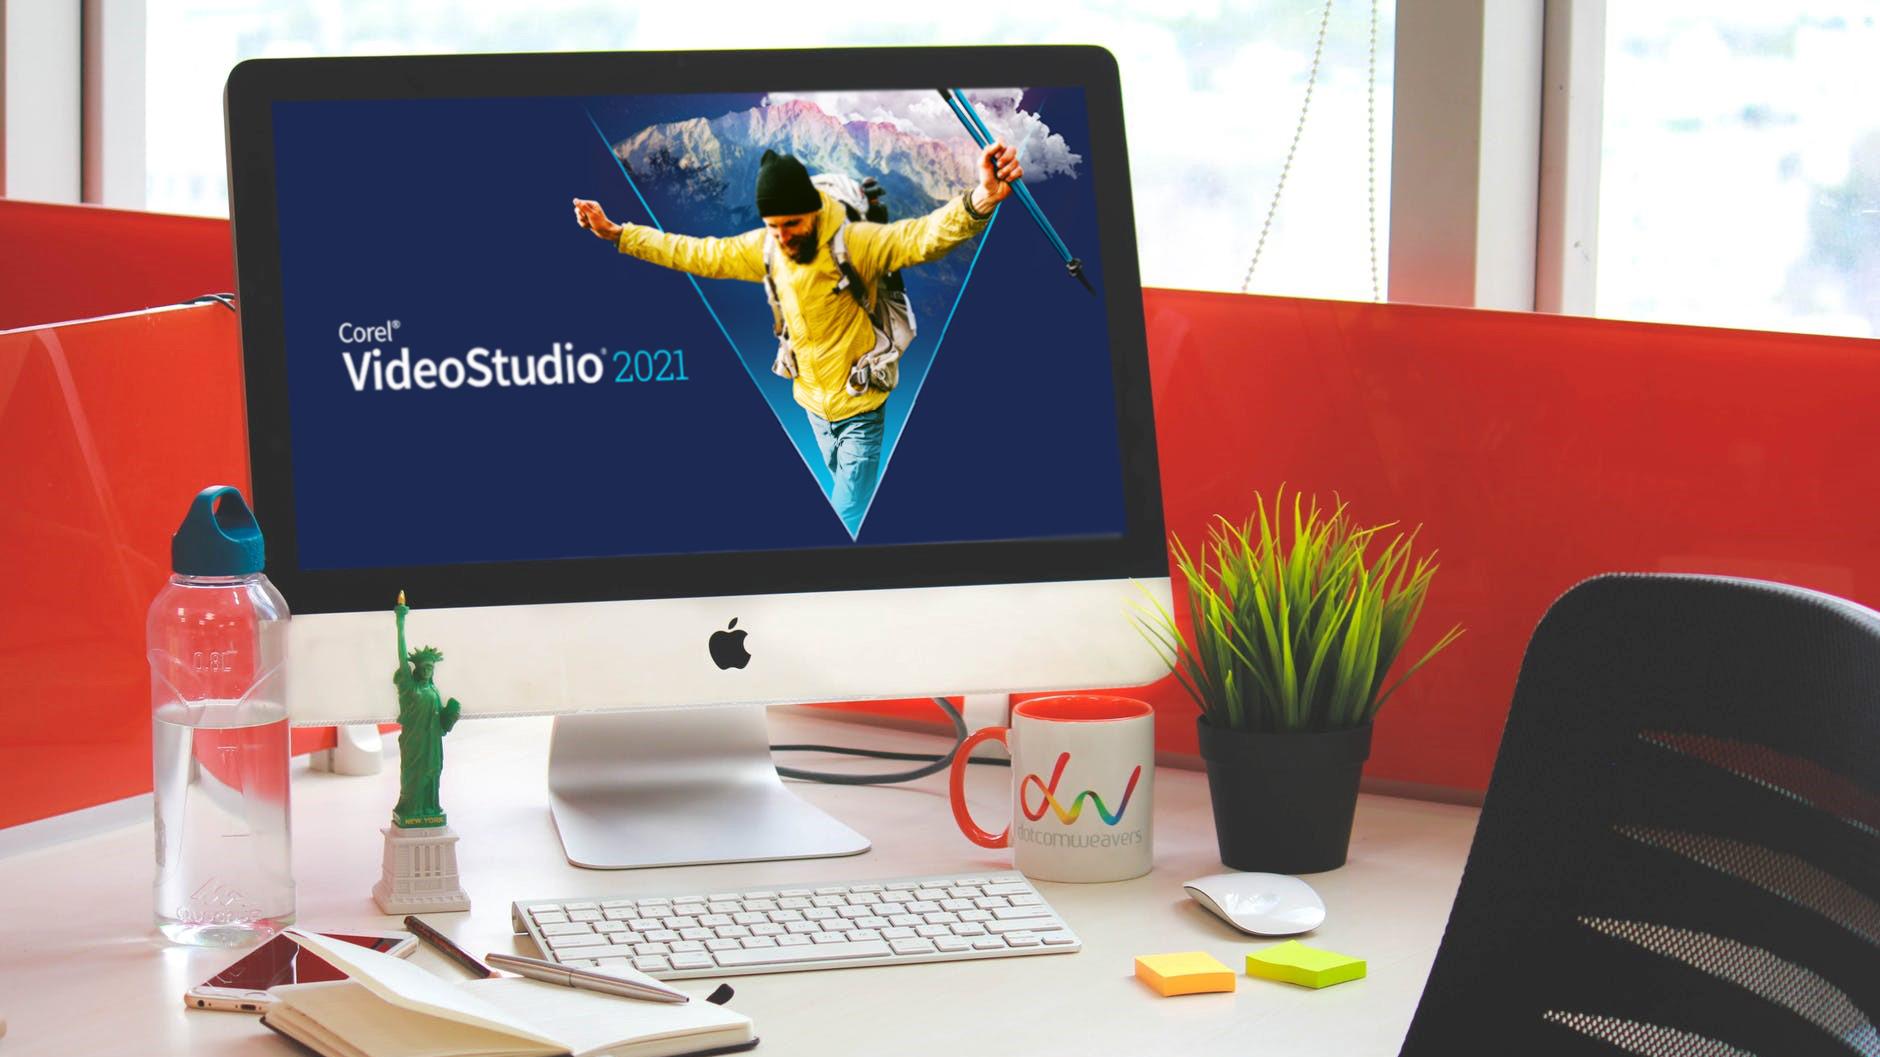 Corel VideoStudio Ultimate 2021 Video Editor